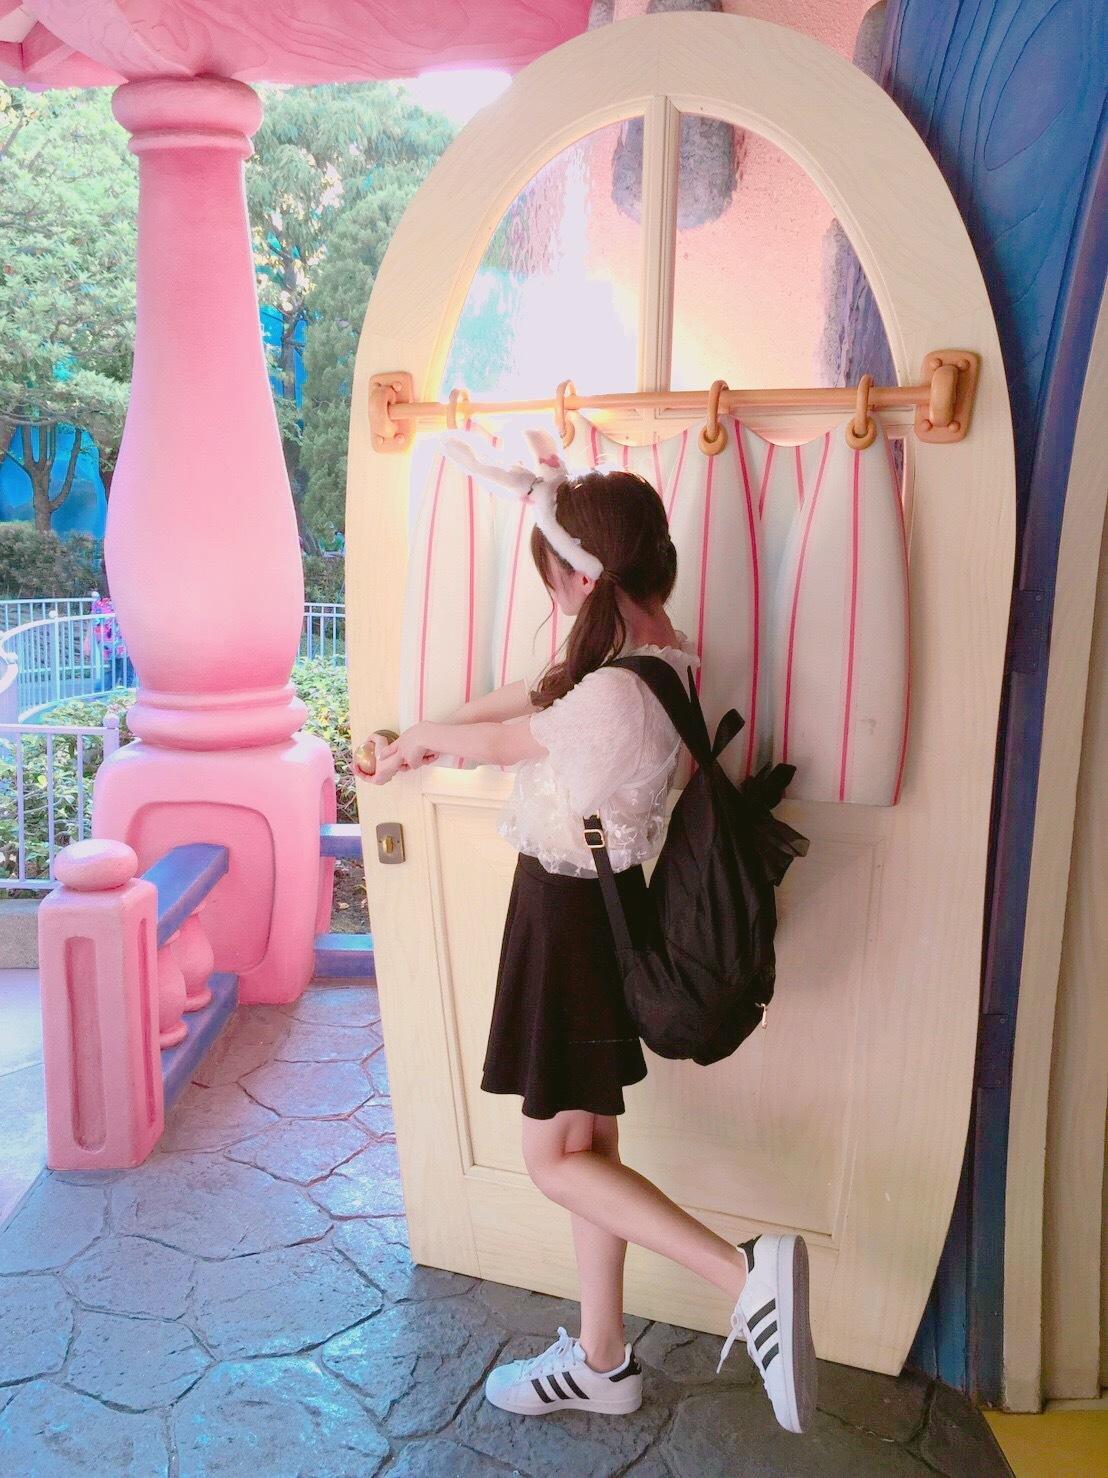 Vol.10♡【ディズニーイースター2017】東京ディズニーランドの写真スポットを紹介☆_1_14